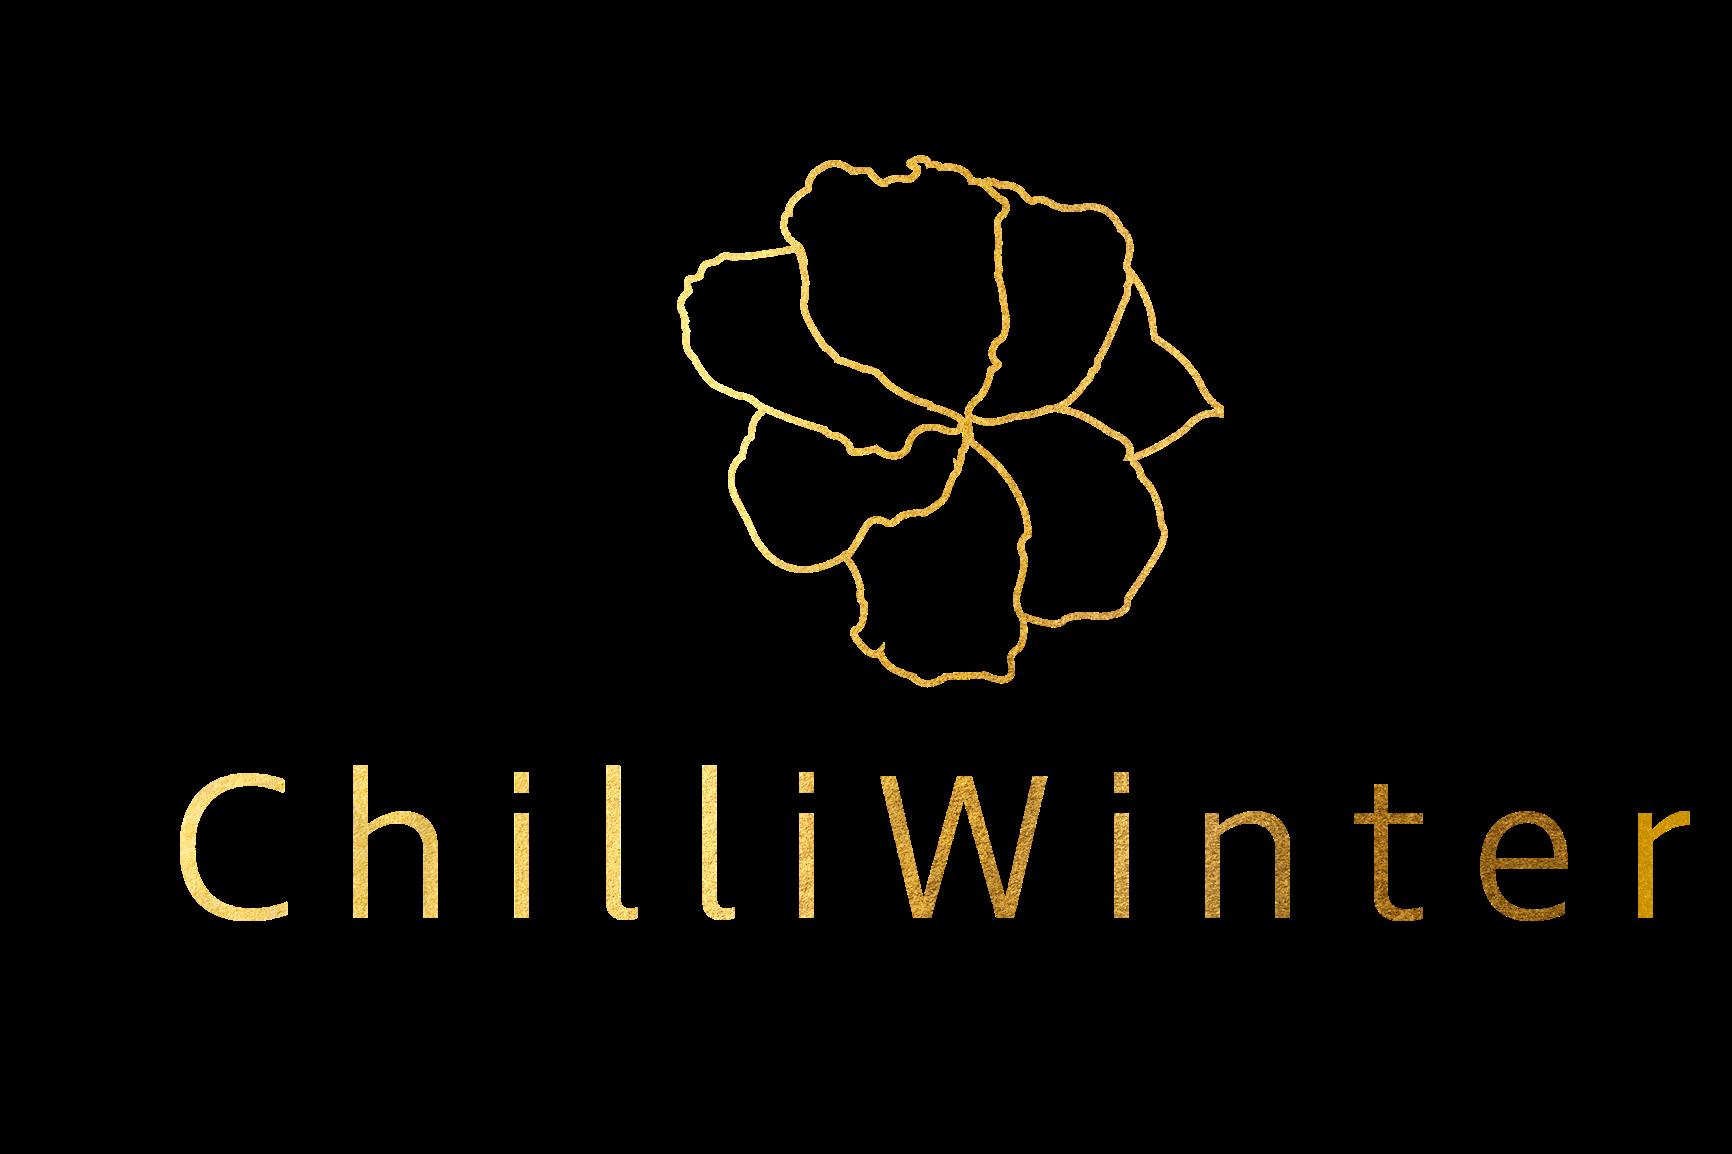 ChilliWinter